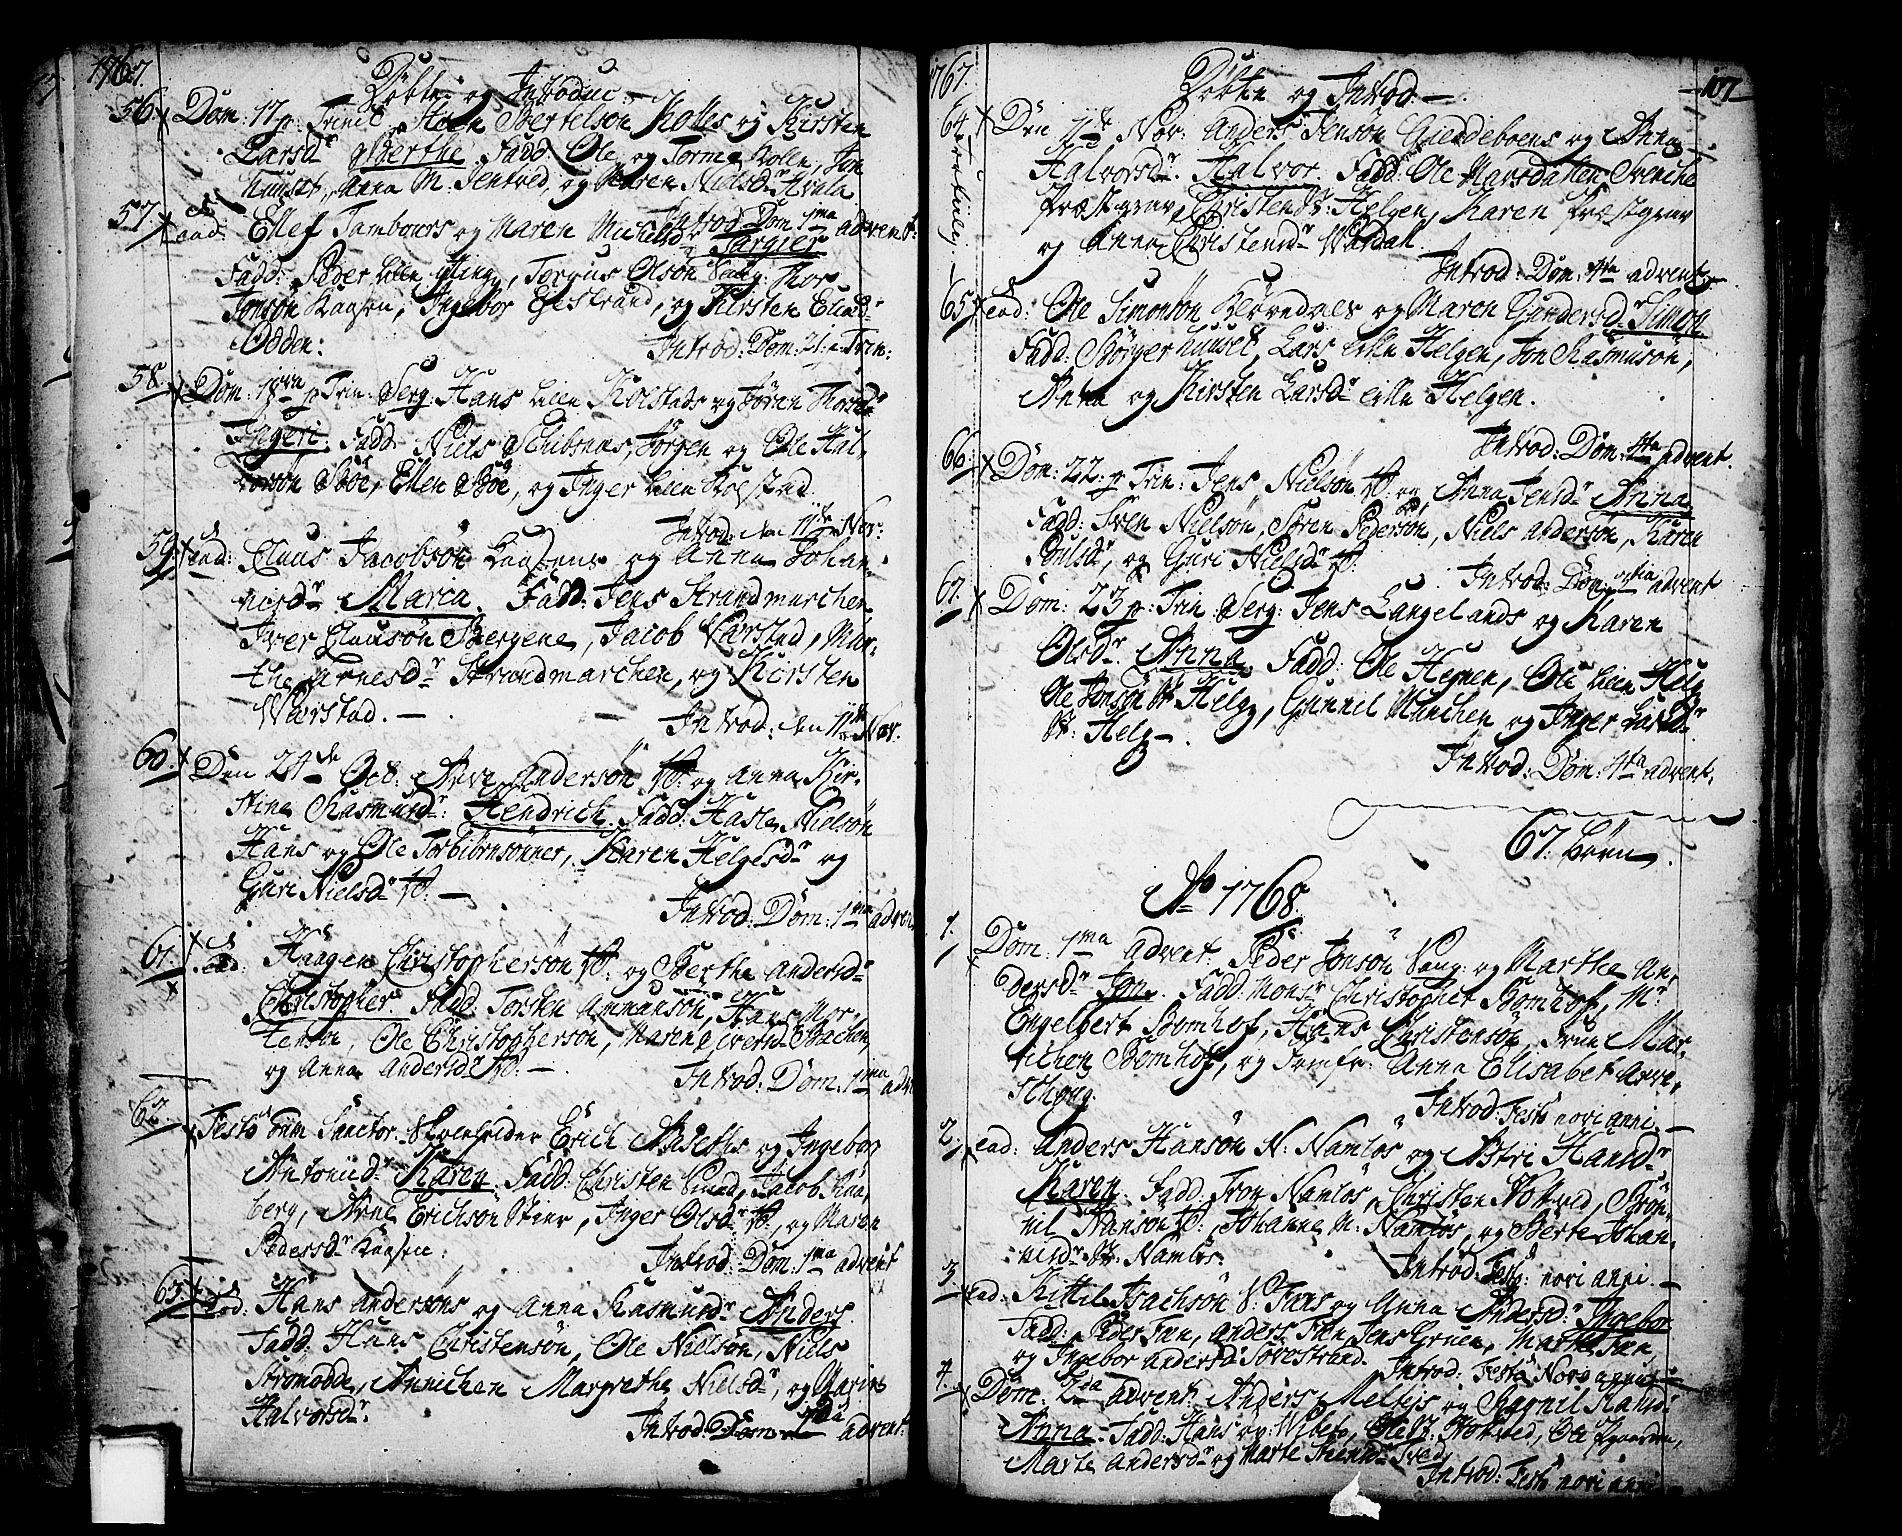 SAKO, Holla kirkebøker, F/Fa/L0001: Ministerialbok nr. 1, 1717-1779, s. 107